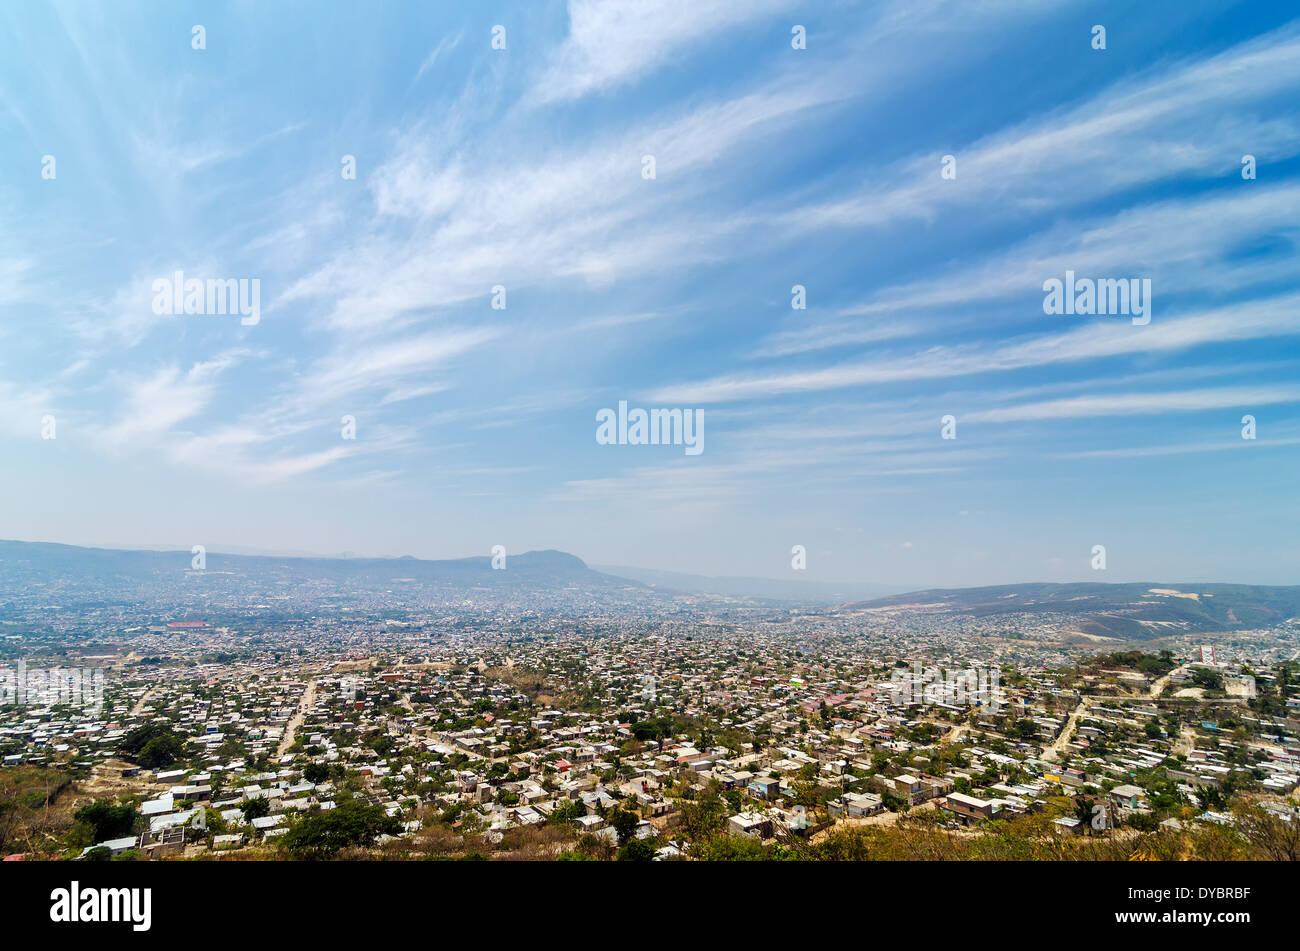 Cityscape of Tuxtla Gutierrez, the capital of Chiapas, Mexico - Stock Image